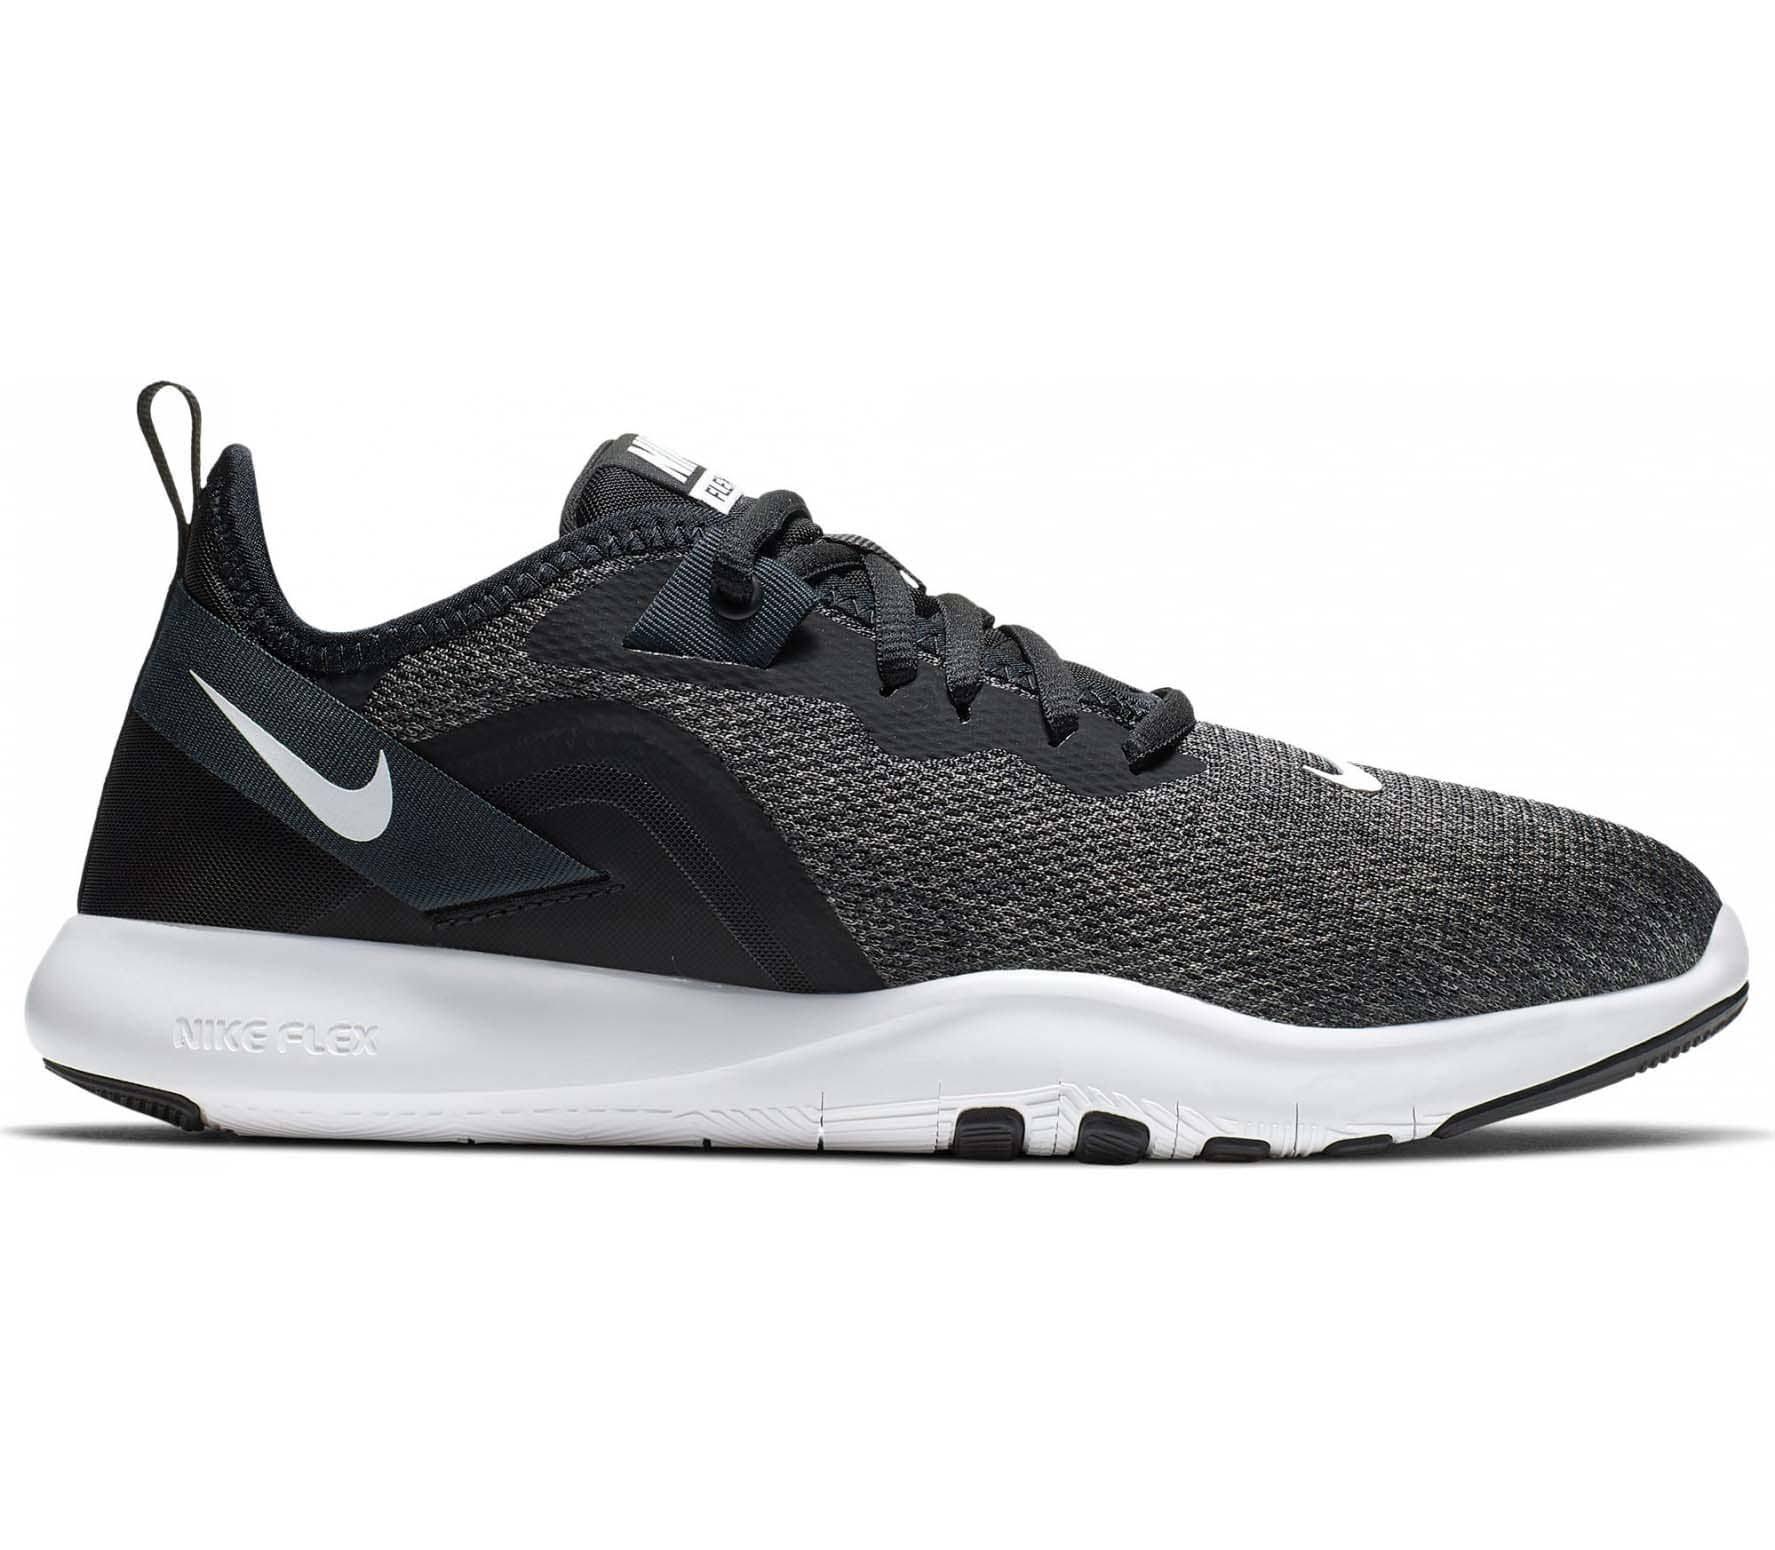 Nike Flex TR 9 Women's - Black